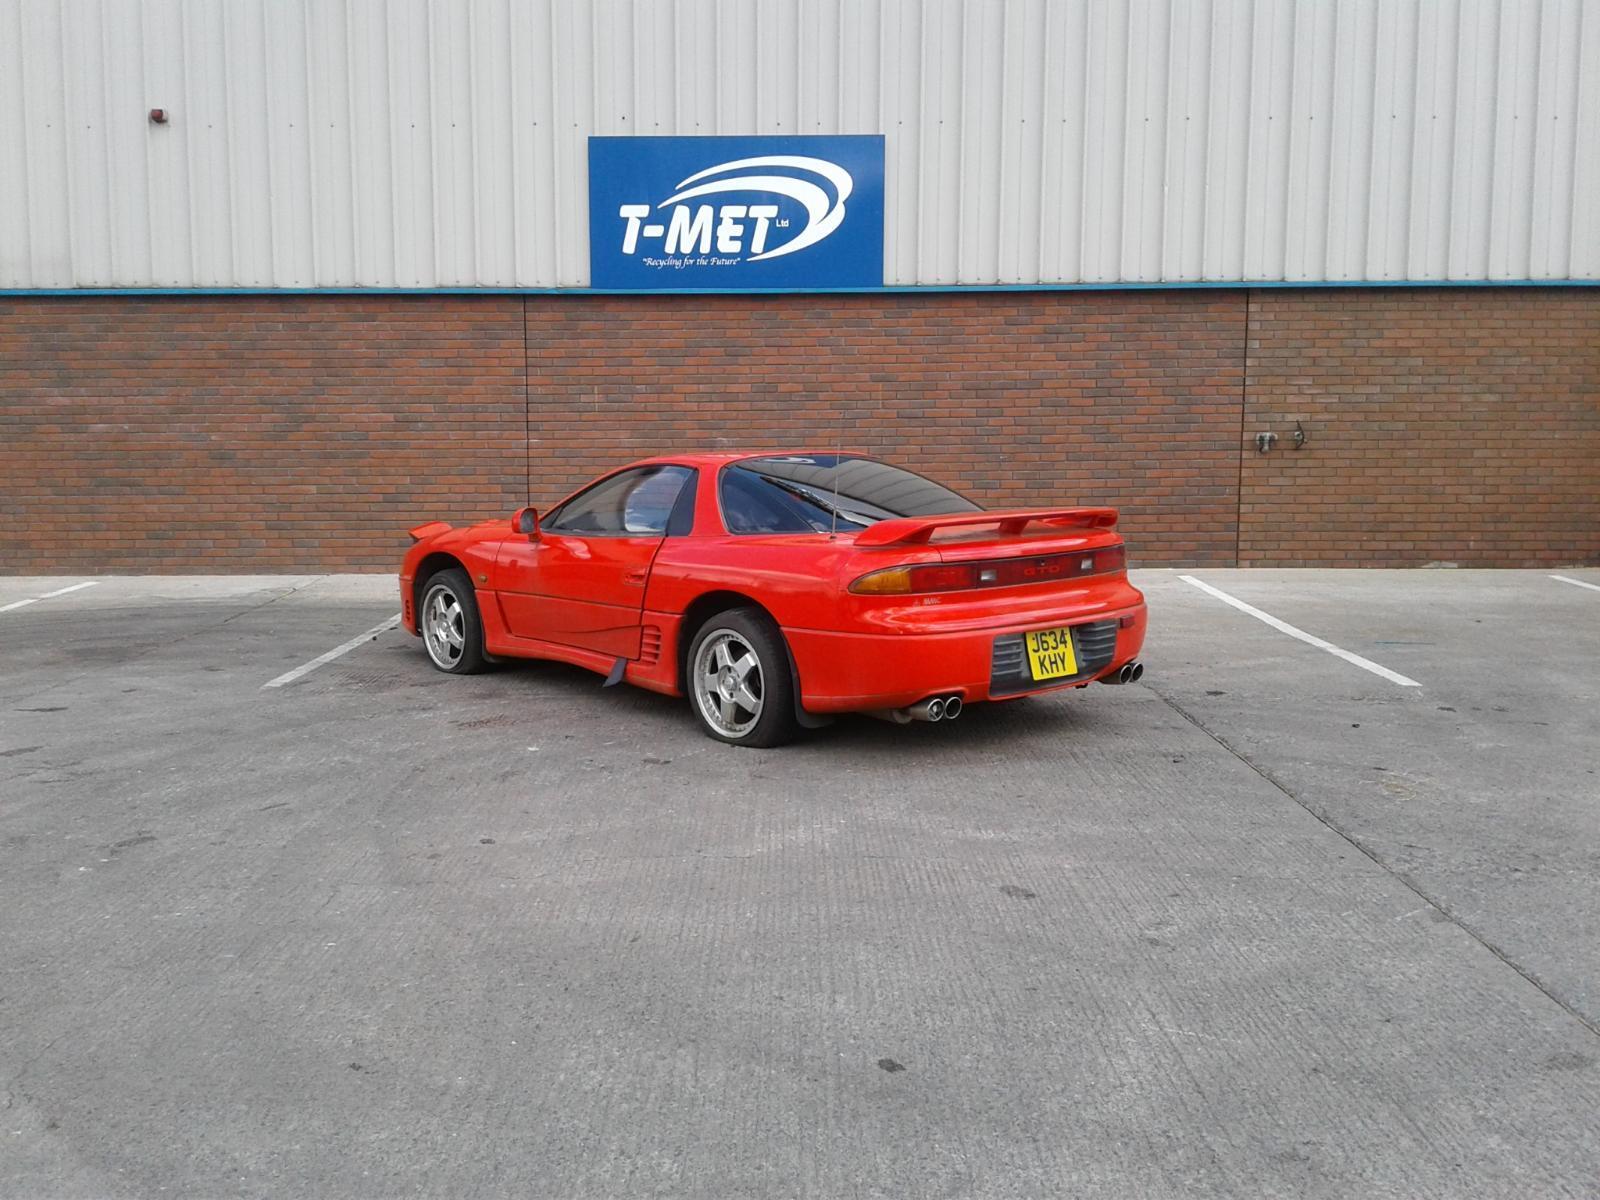 2001 Mitsubishi GTO Image